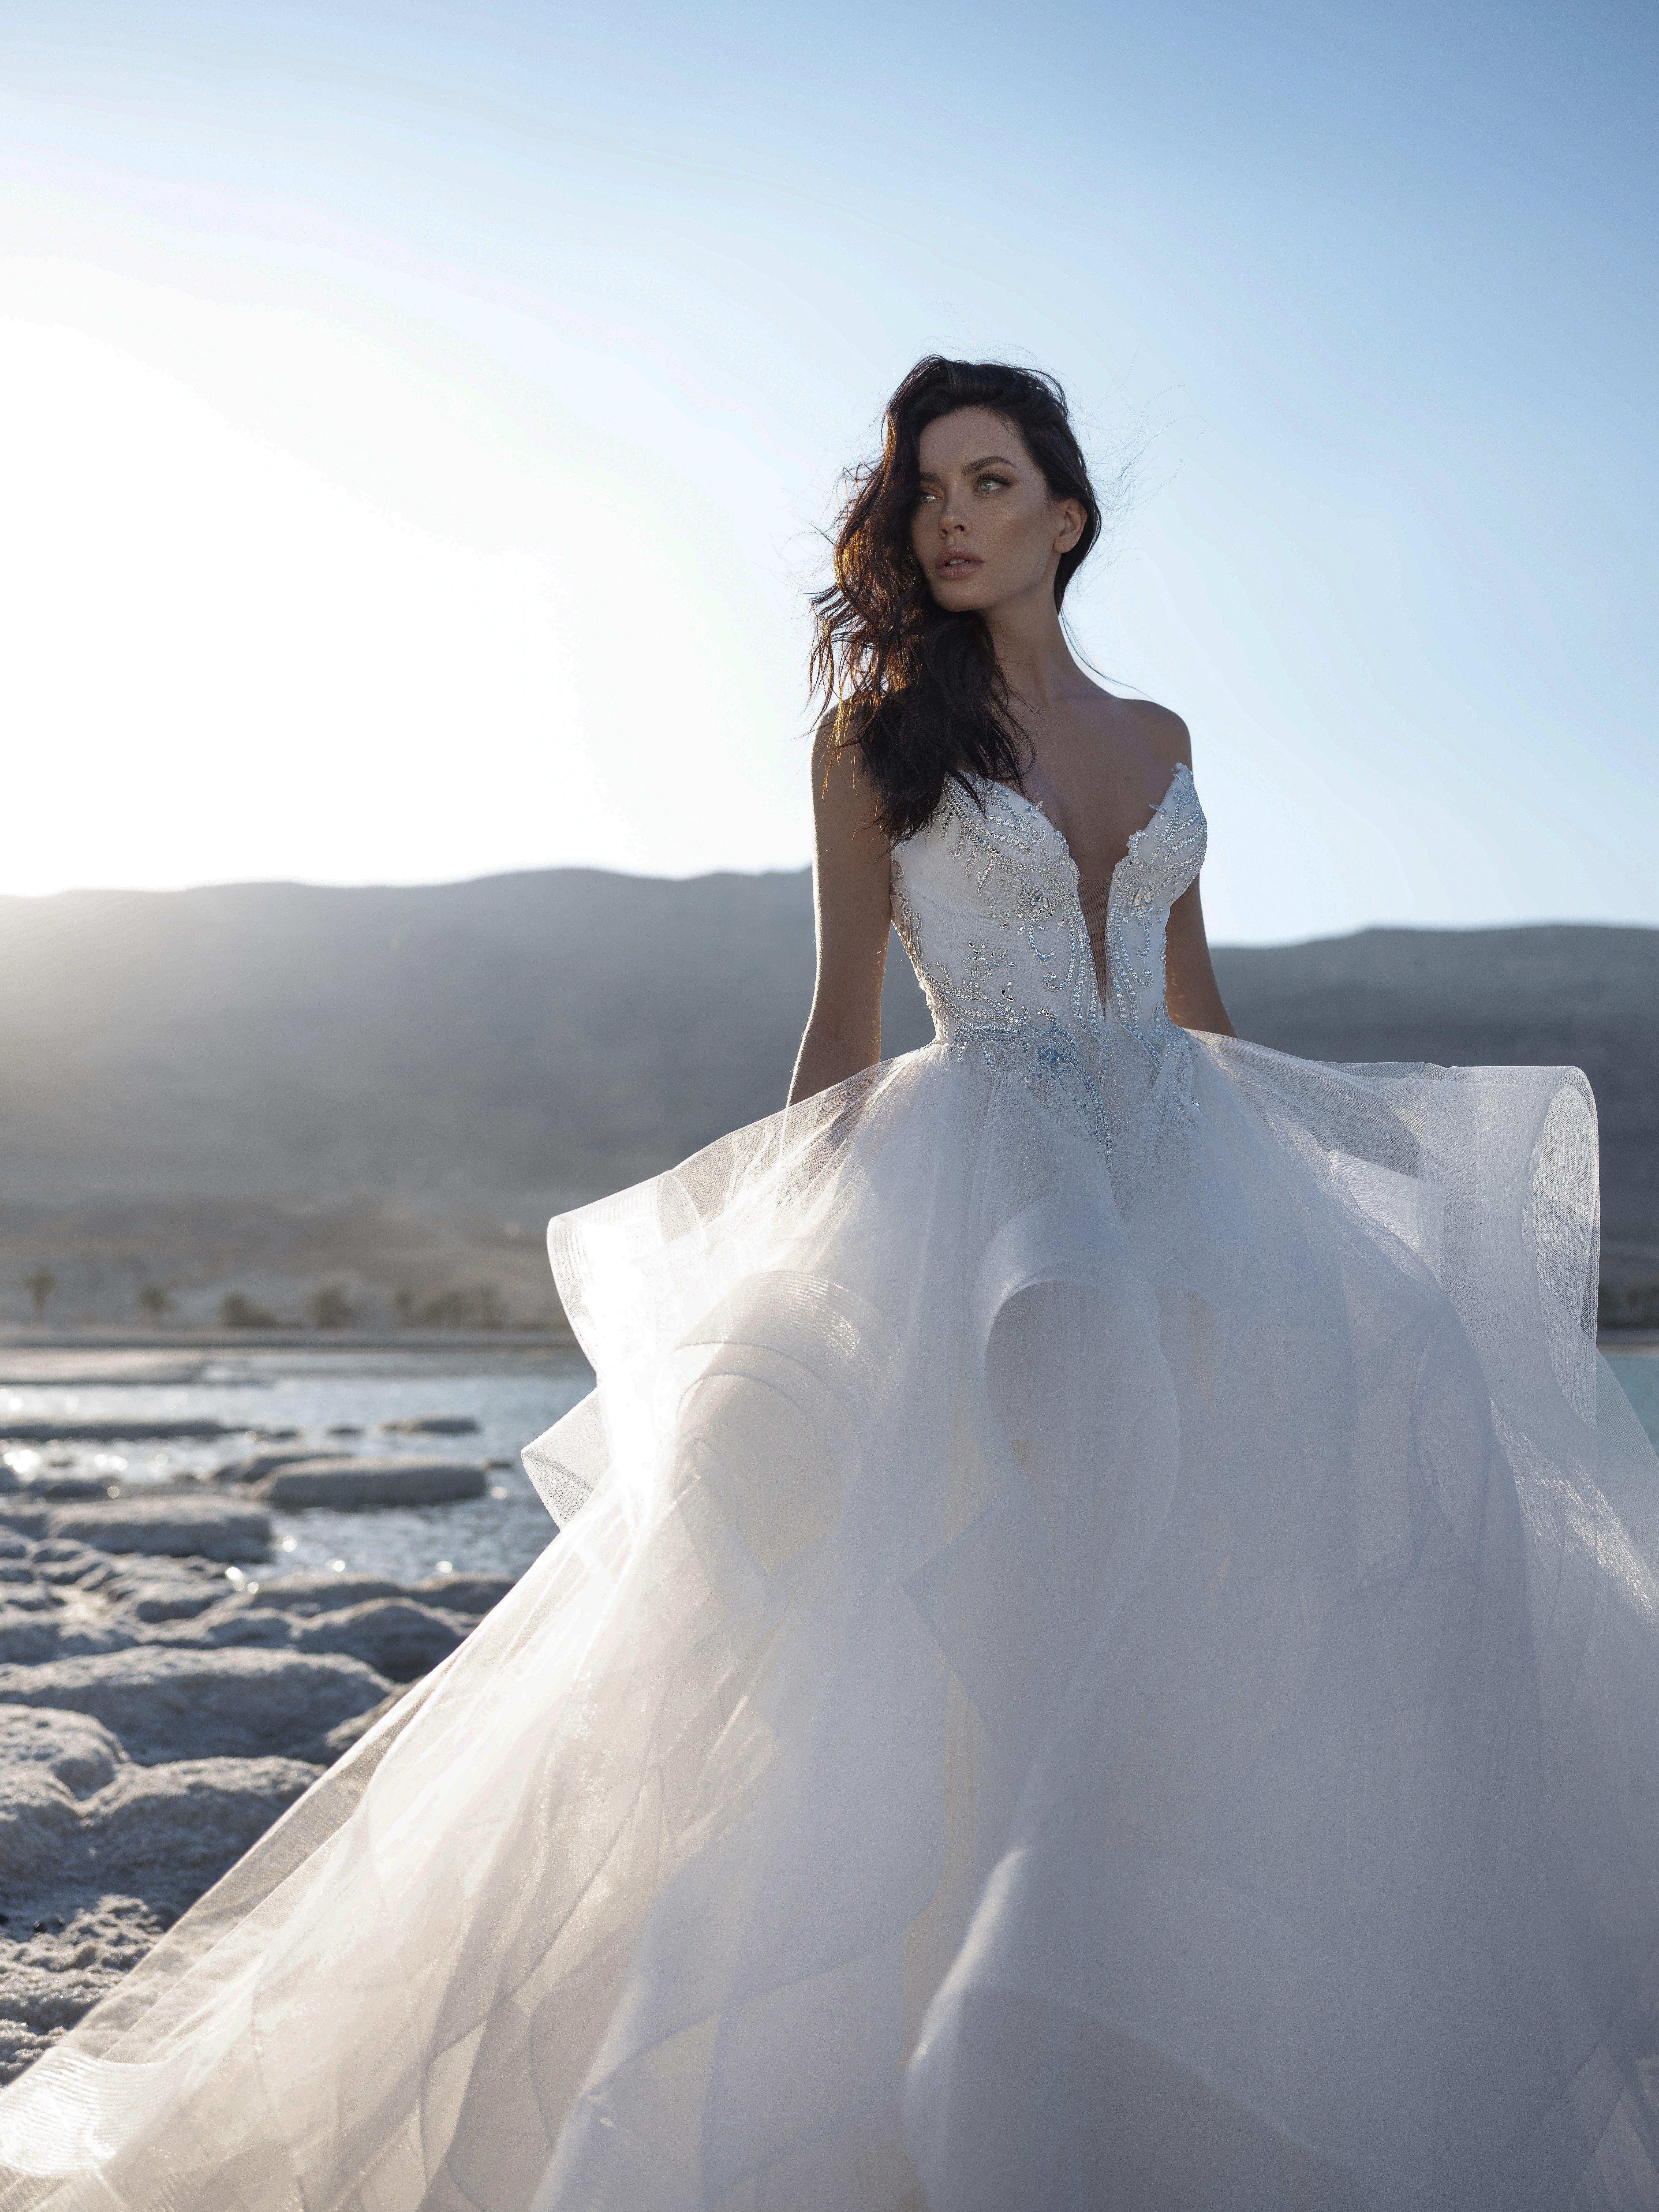 Pnina Tornai Bridal Wedding Dress Collection Spring 2020